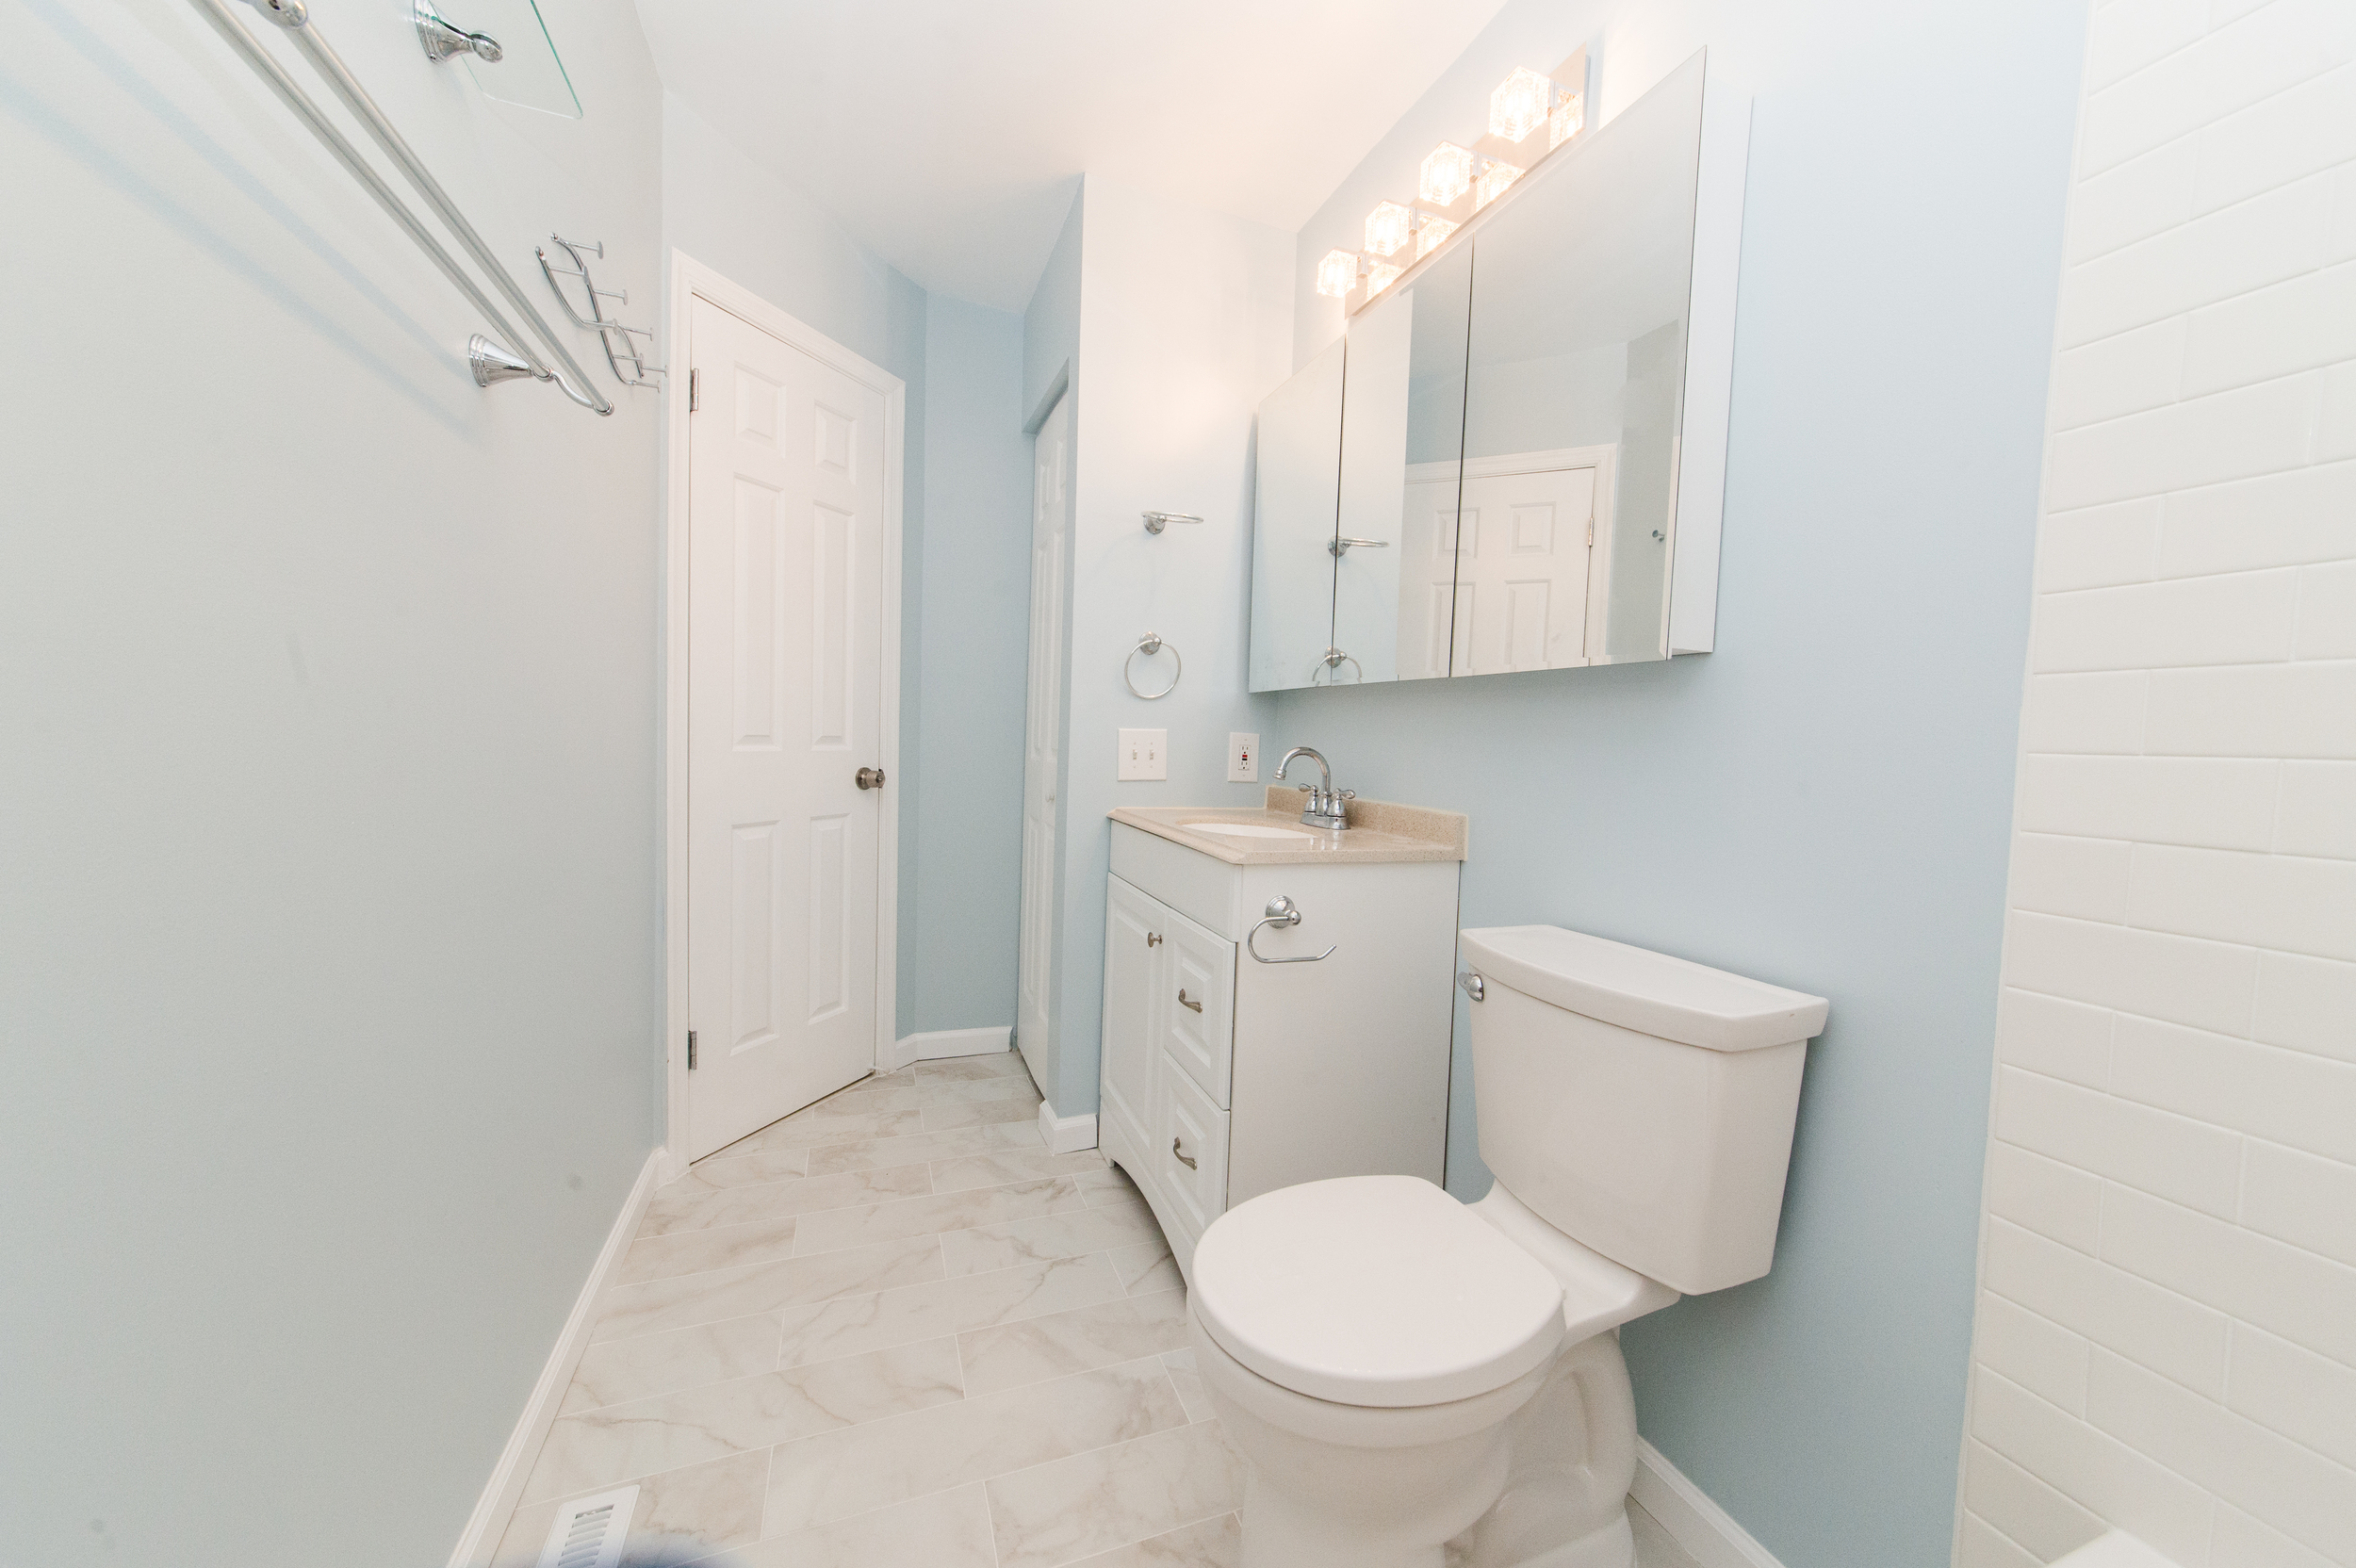 Ellicot City Bathroom Remodeler-5.jpg